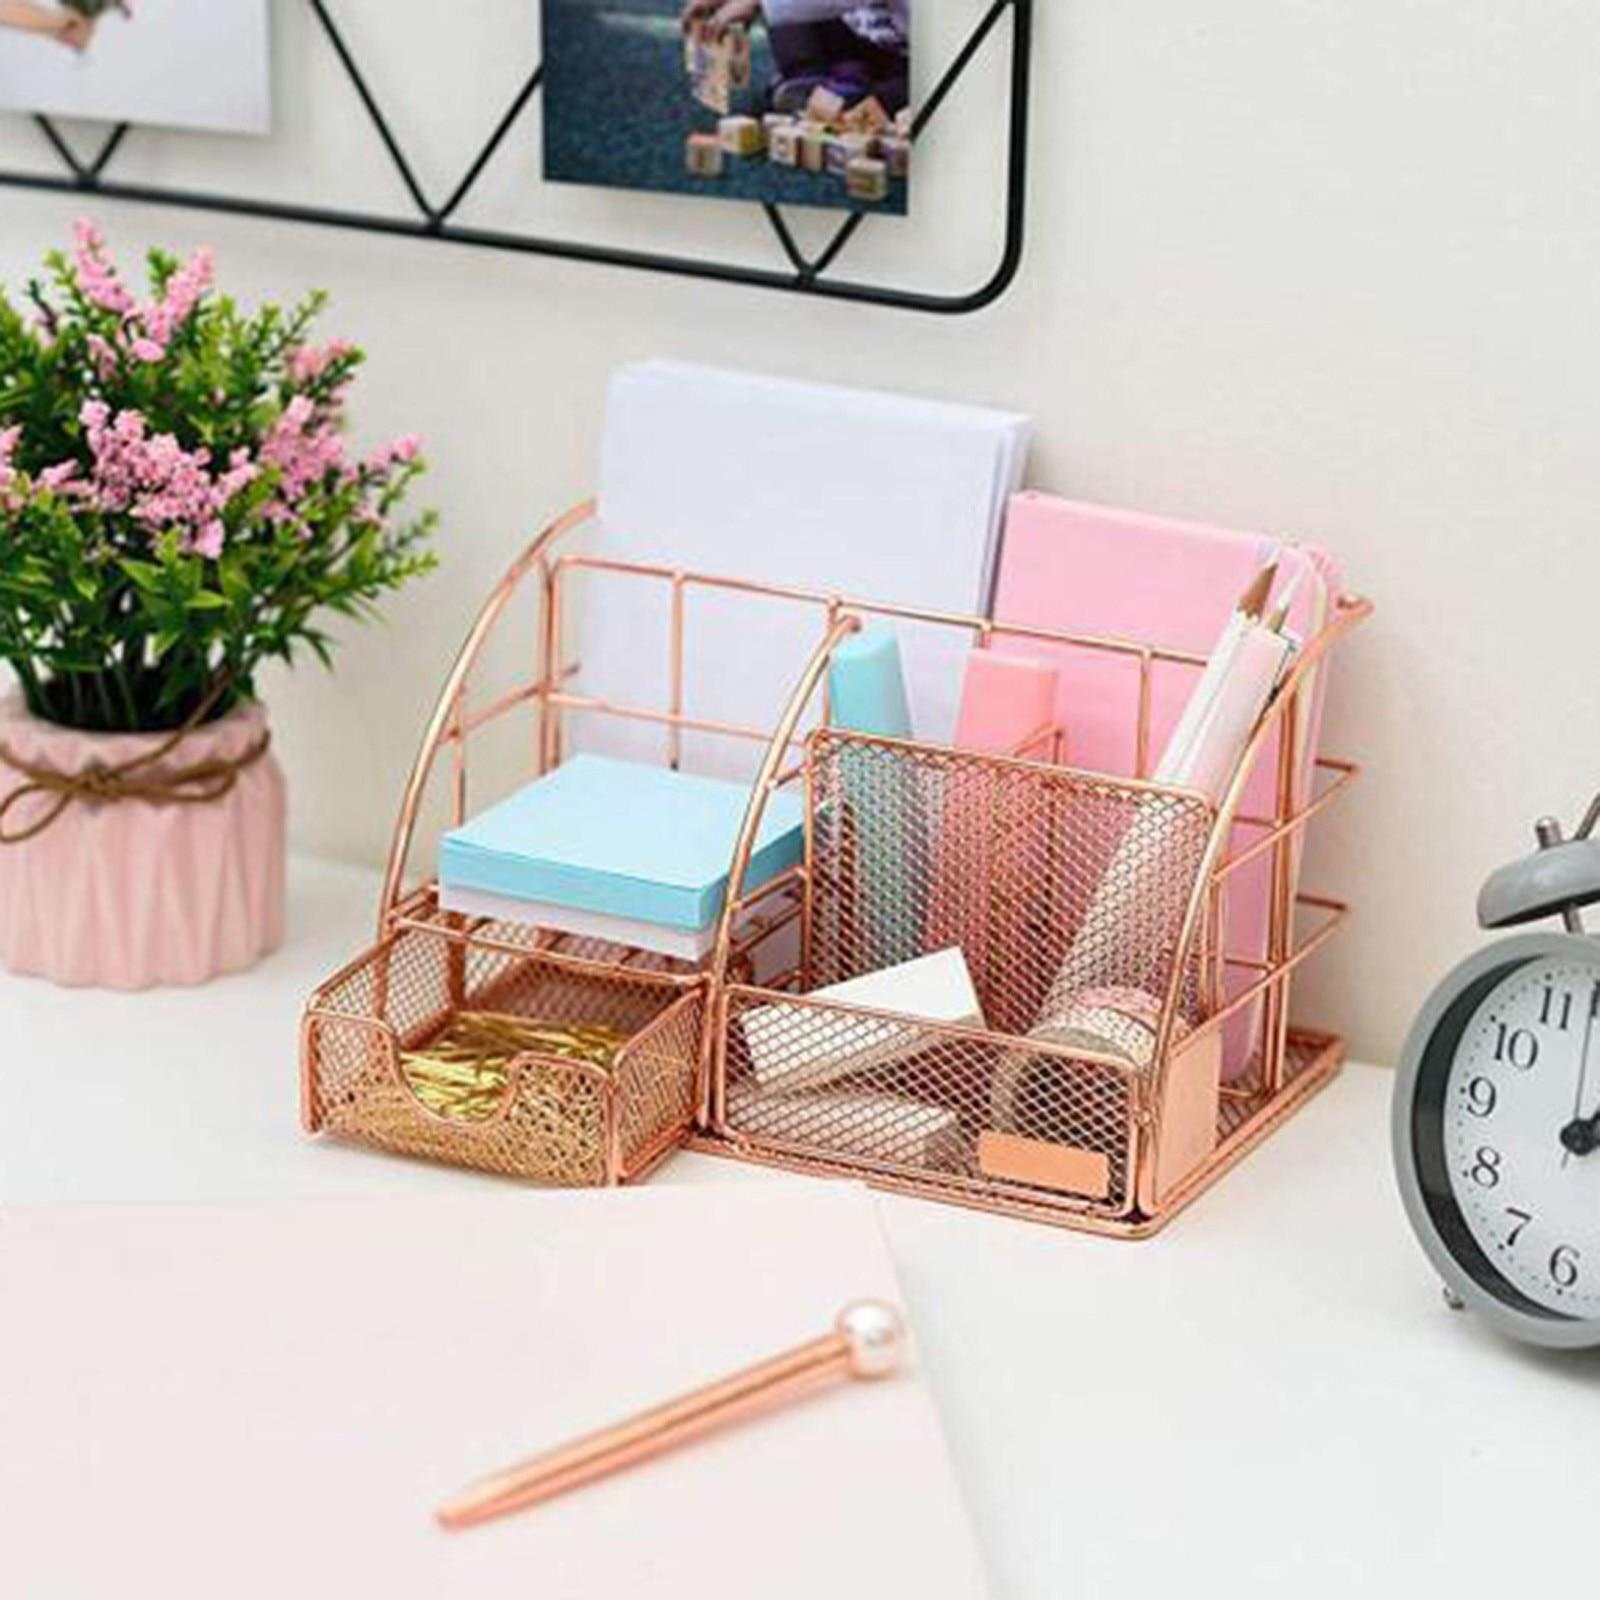 Mesh Office Supplies Home Desk Organizer Accessories With Drawer For Home Office Desktop Rose Gold Étagère de support de stockag